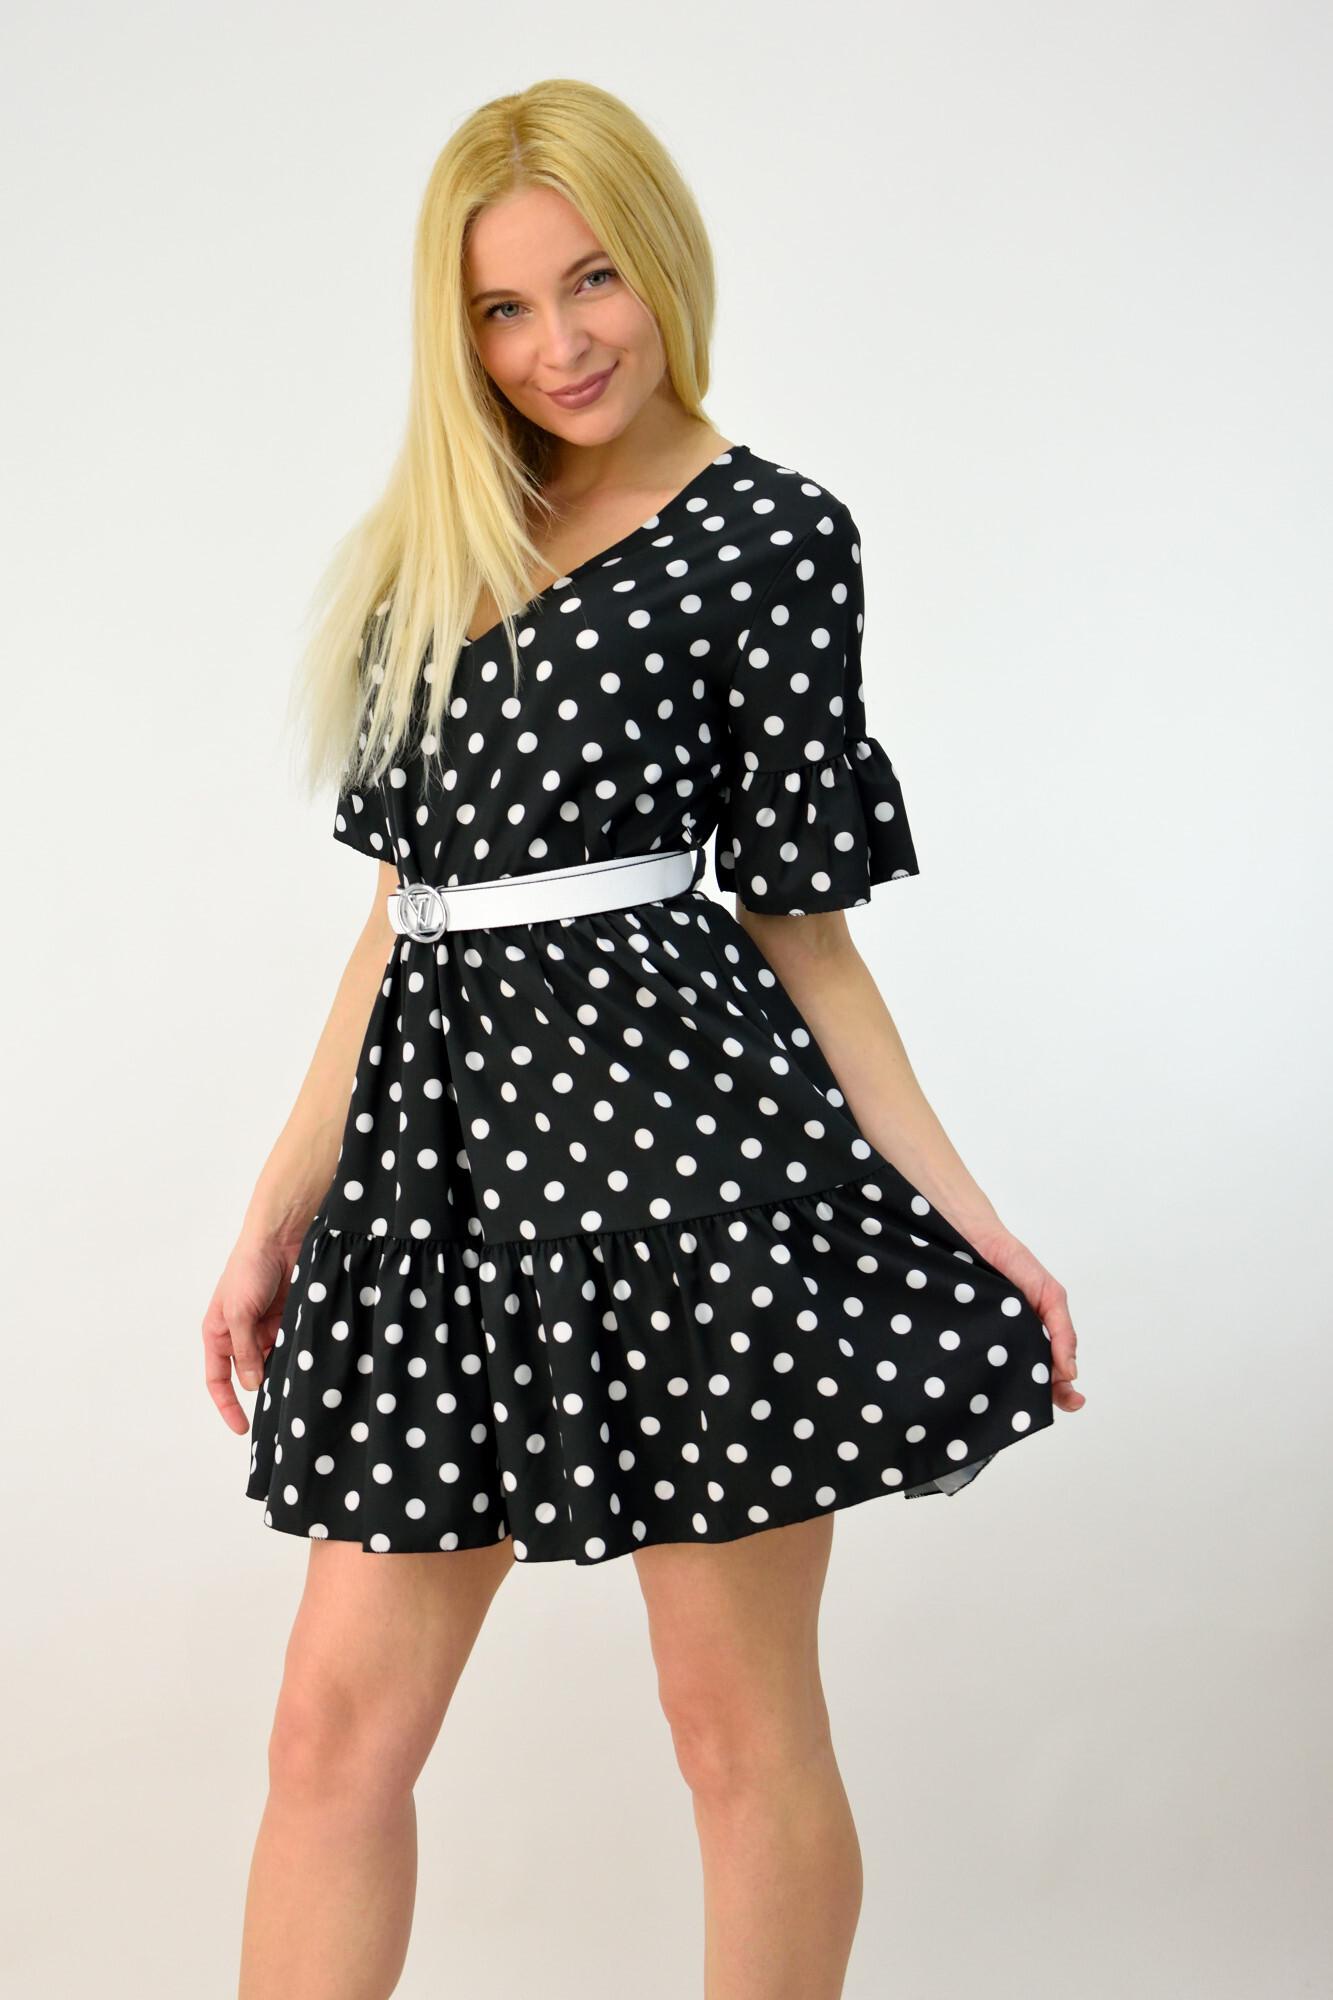 e810478fb81 Γυναικείο φόρεμα μίνι πουά. Tap to expand